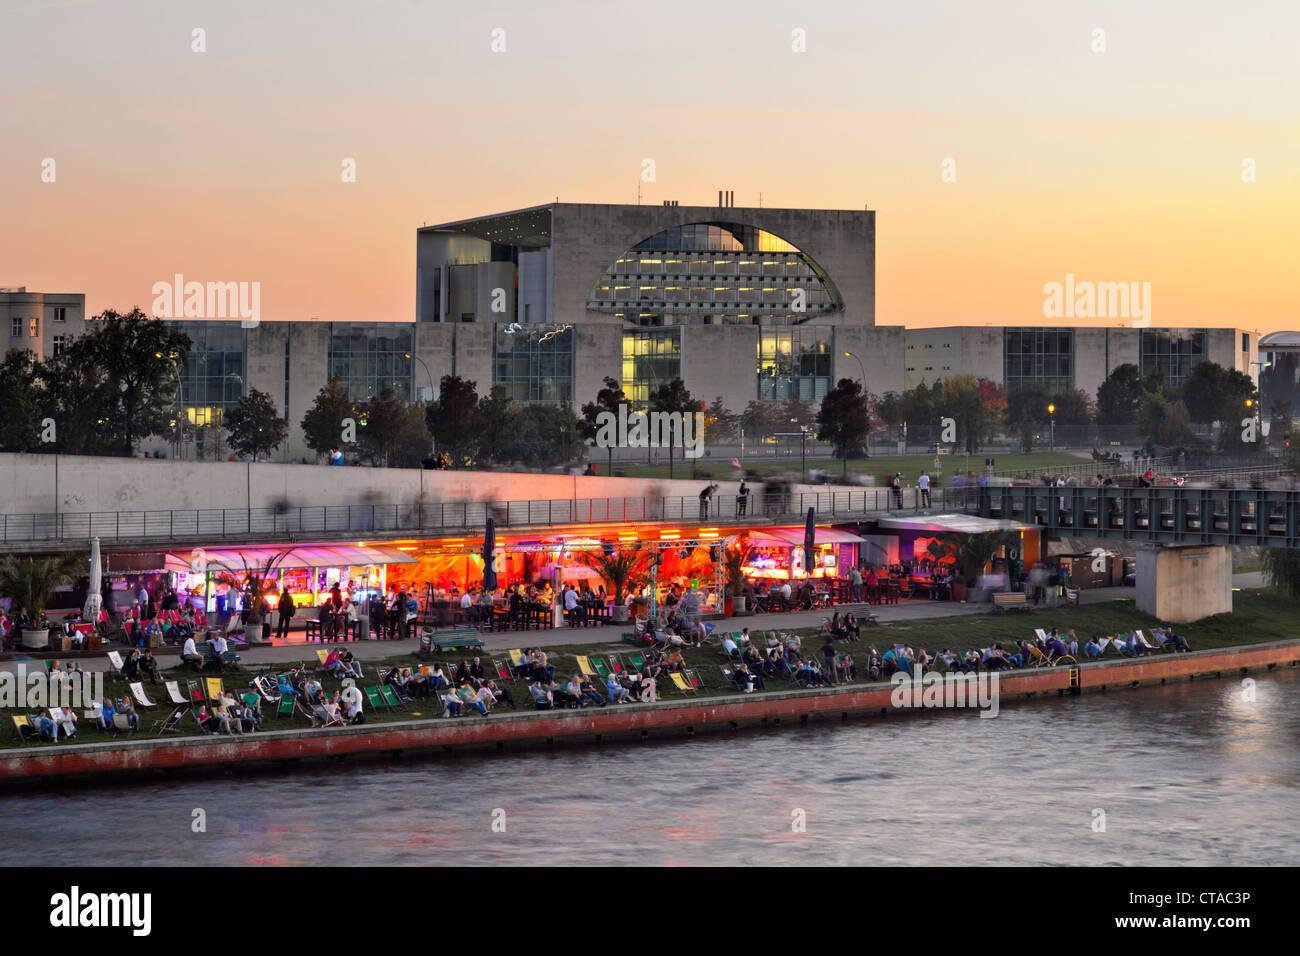 Capital Beach Cafe am Ufer der Spree, neuen Bundeskanzleramt bei Dämmerung, Berlin, Deutschland, Europa Stockbild